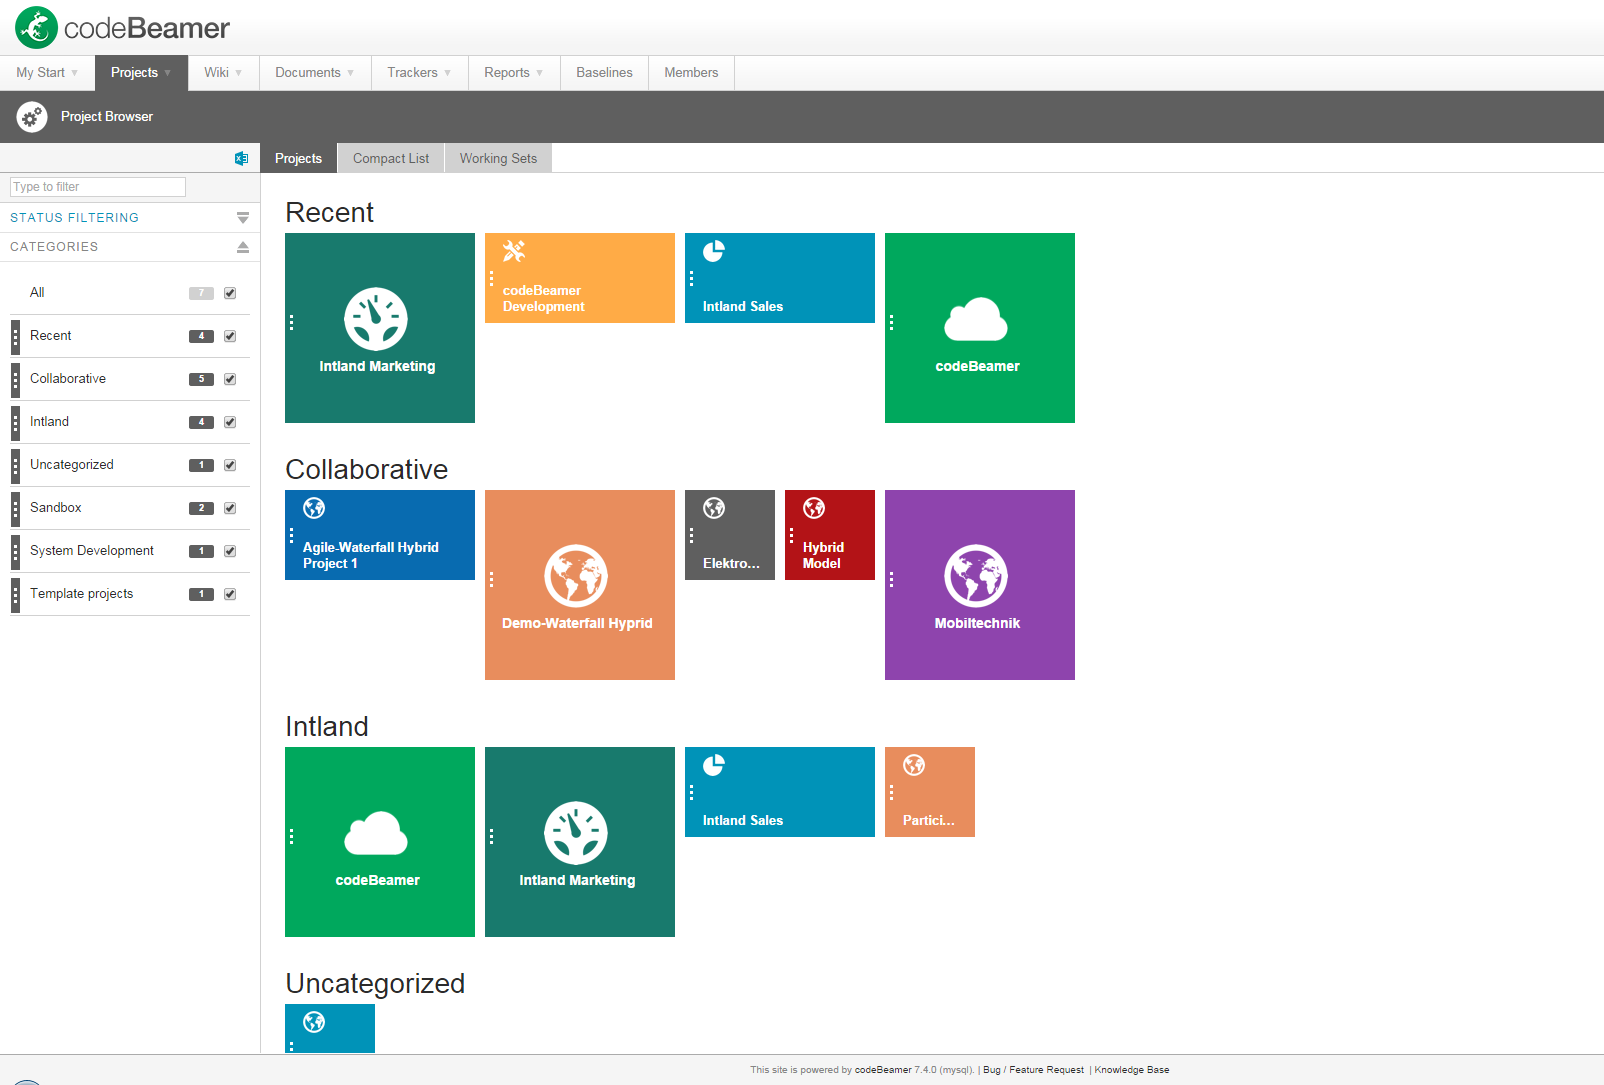 project_browser Efficient Project Management with the Project Browser project management